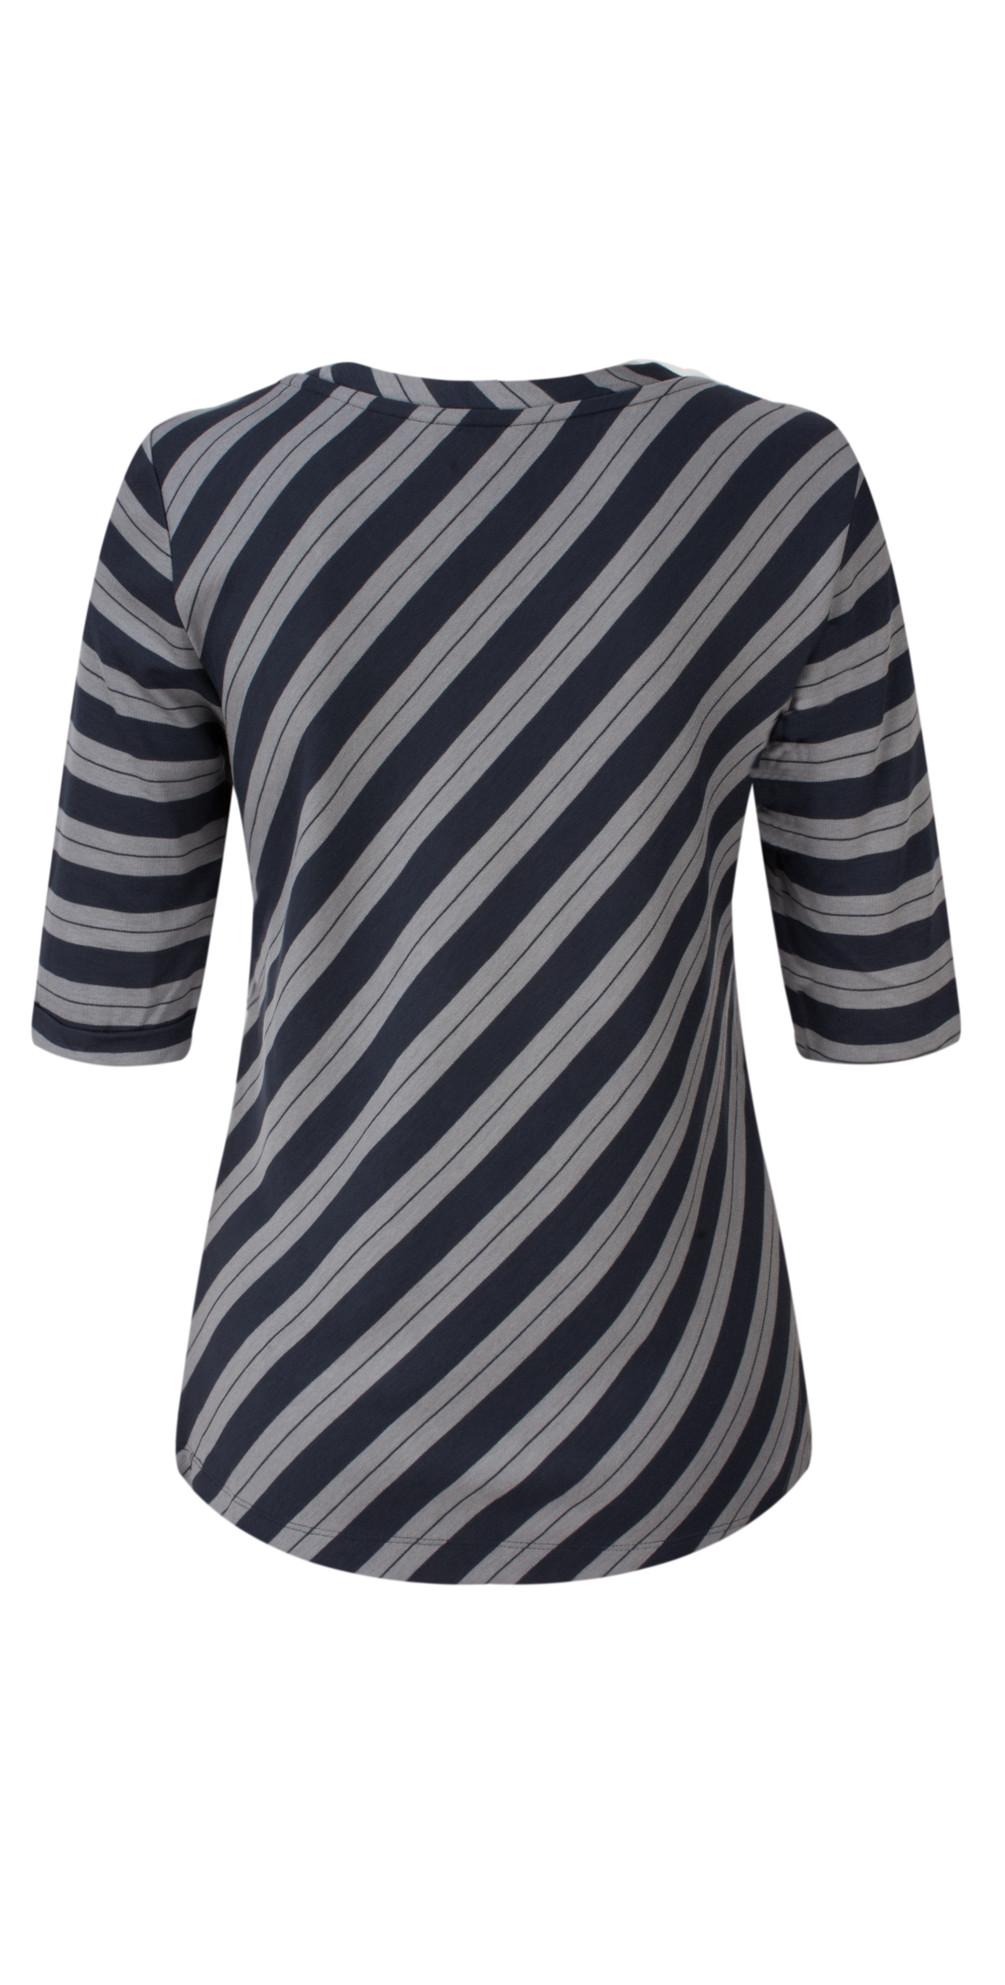 Striped Viscose Jersey Top main image